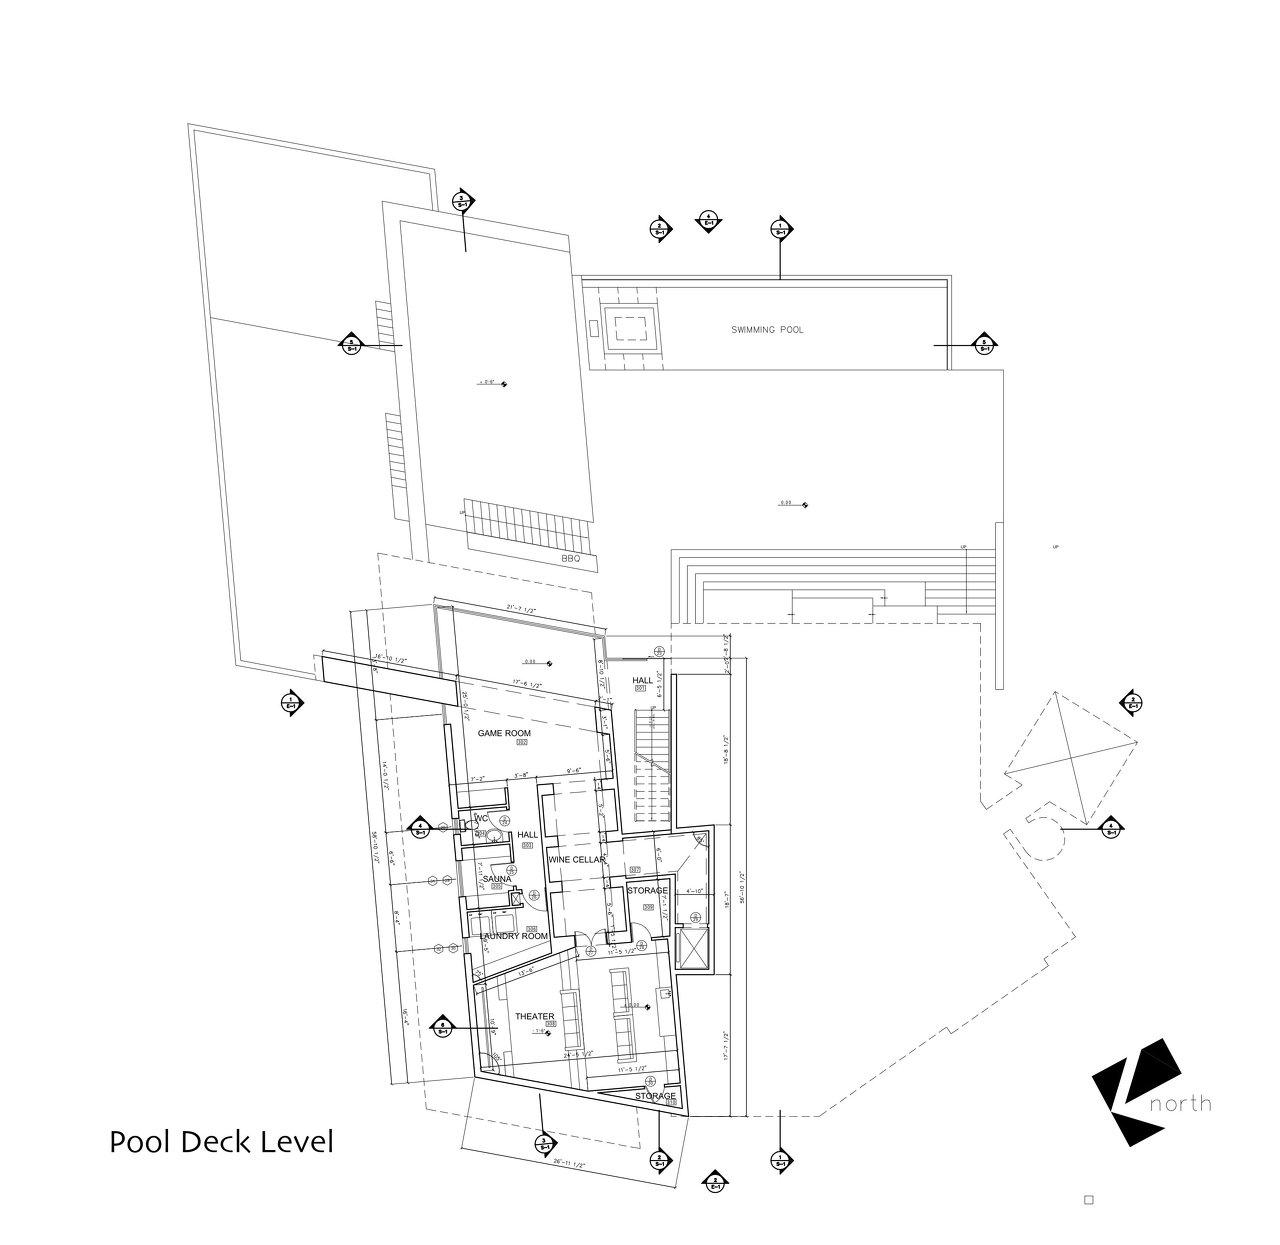 Pool Deck Level